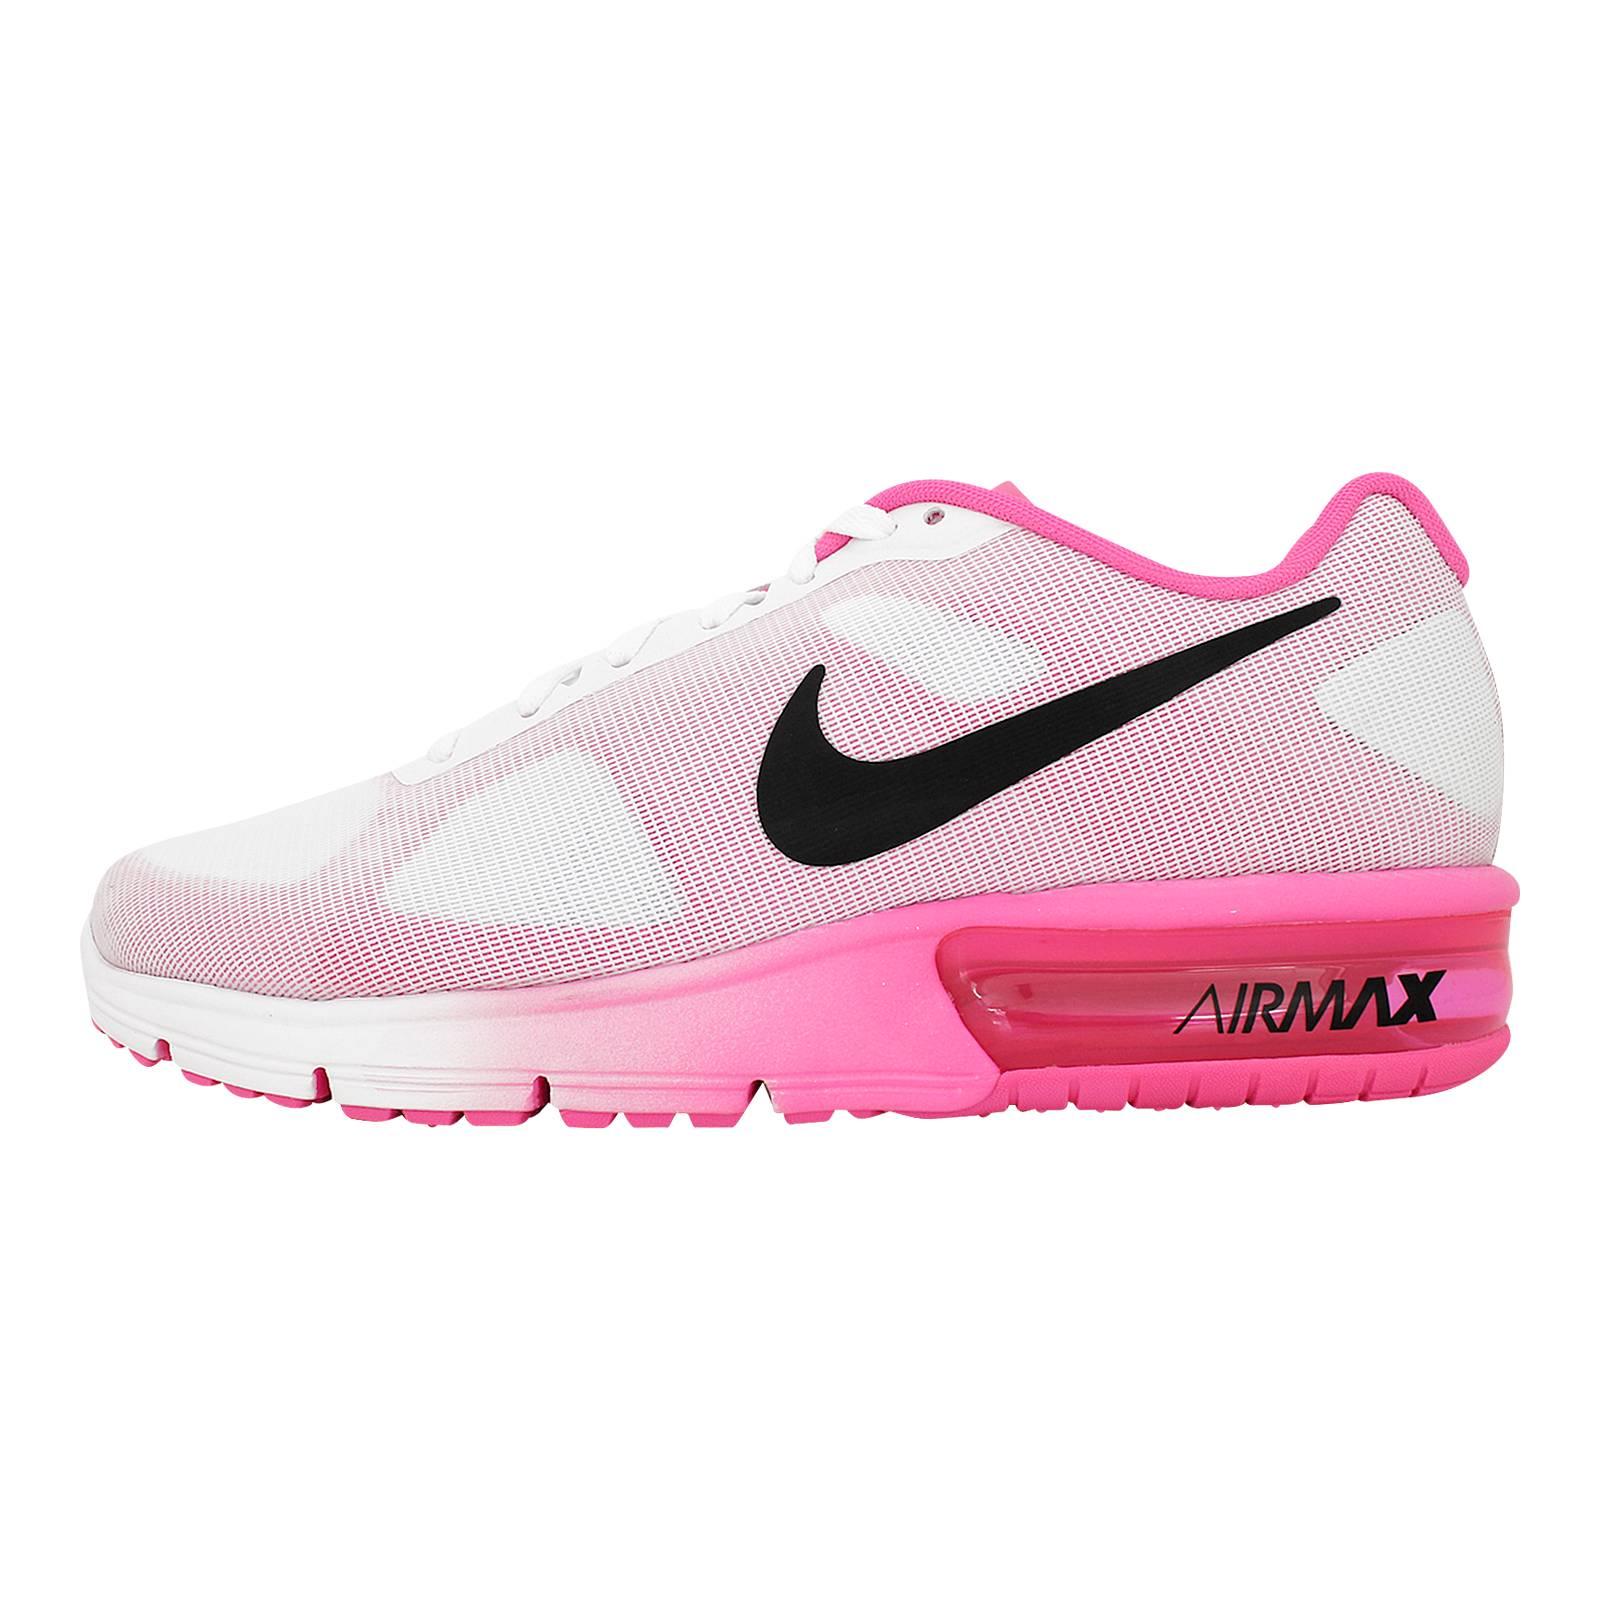 Air Max Sequent - Γυναικεία αθλητικά παπούτσια Nike από υφασμα ... d47b10b27e6